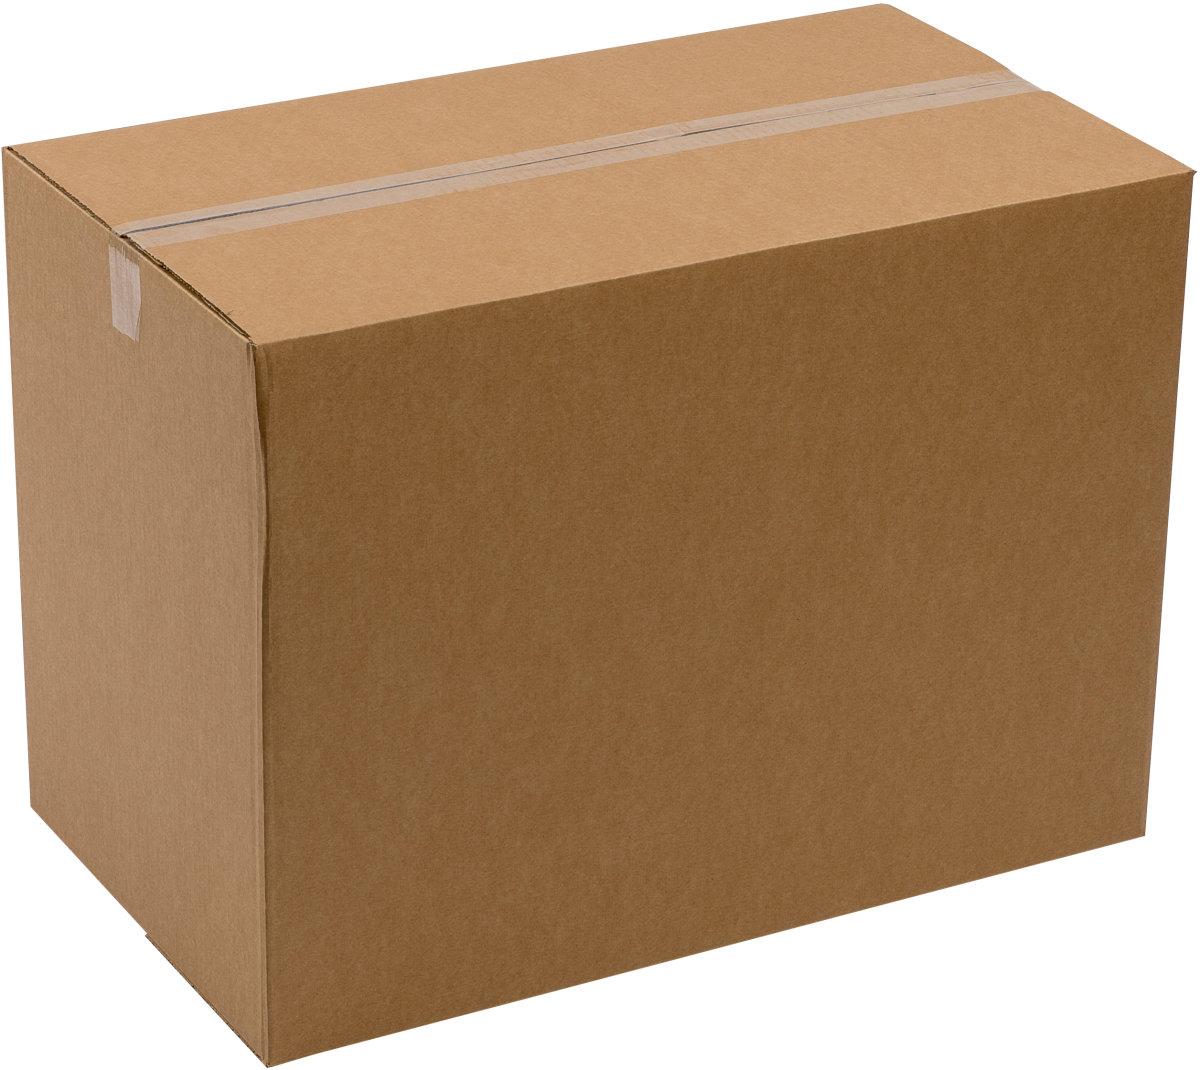 Papkasse 1-lags, 700 x 400 x 500 mm